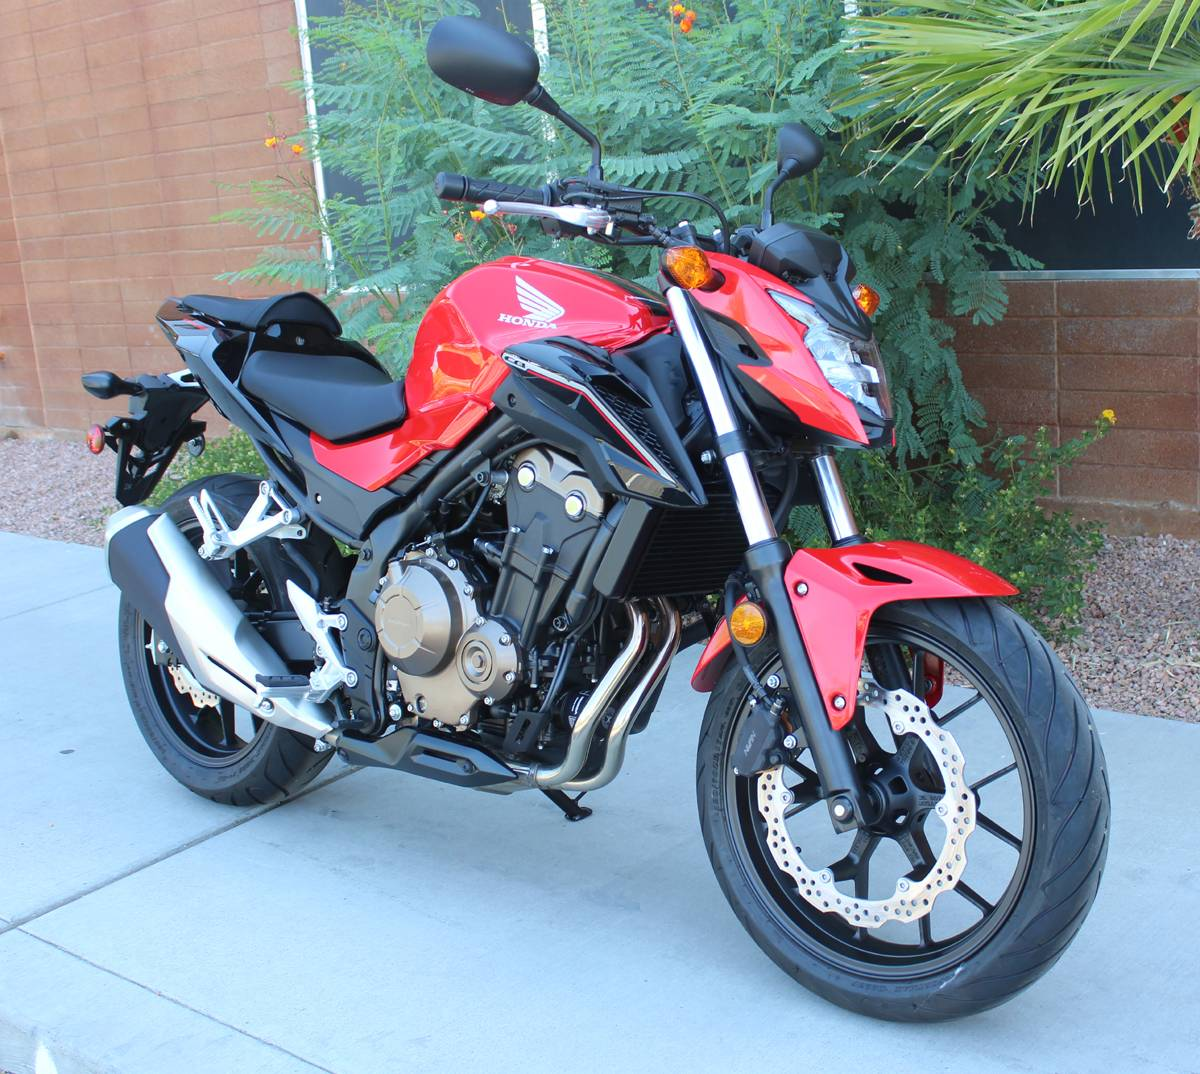 new 2017 honda cb500f motorcycles in kingman az stock. Black Bedroom Furniture Sets. Home Design Ideas